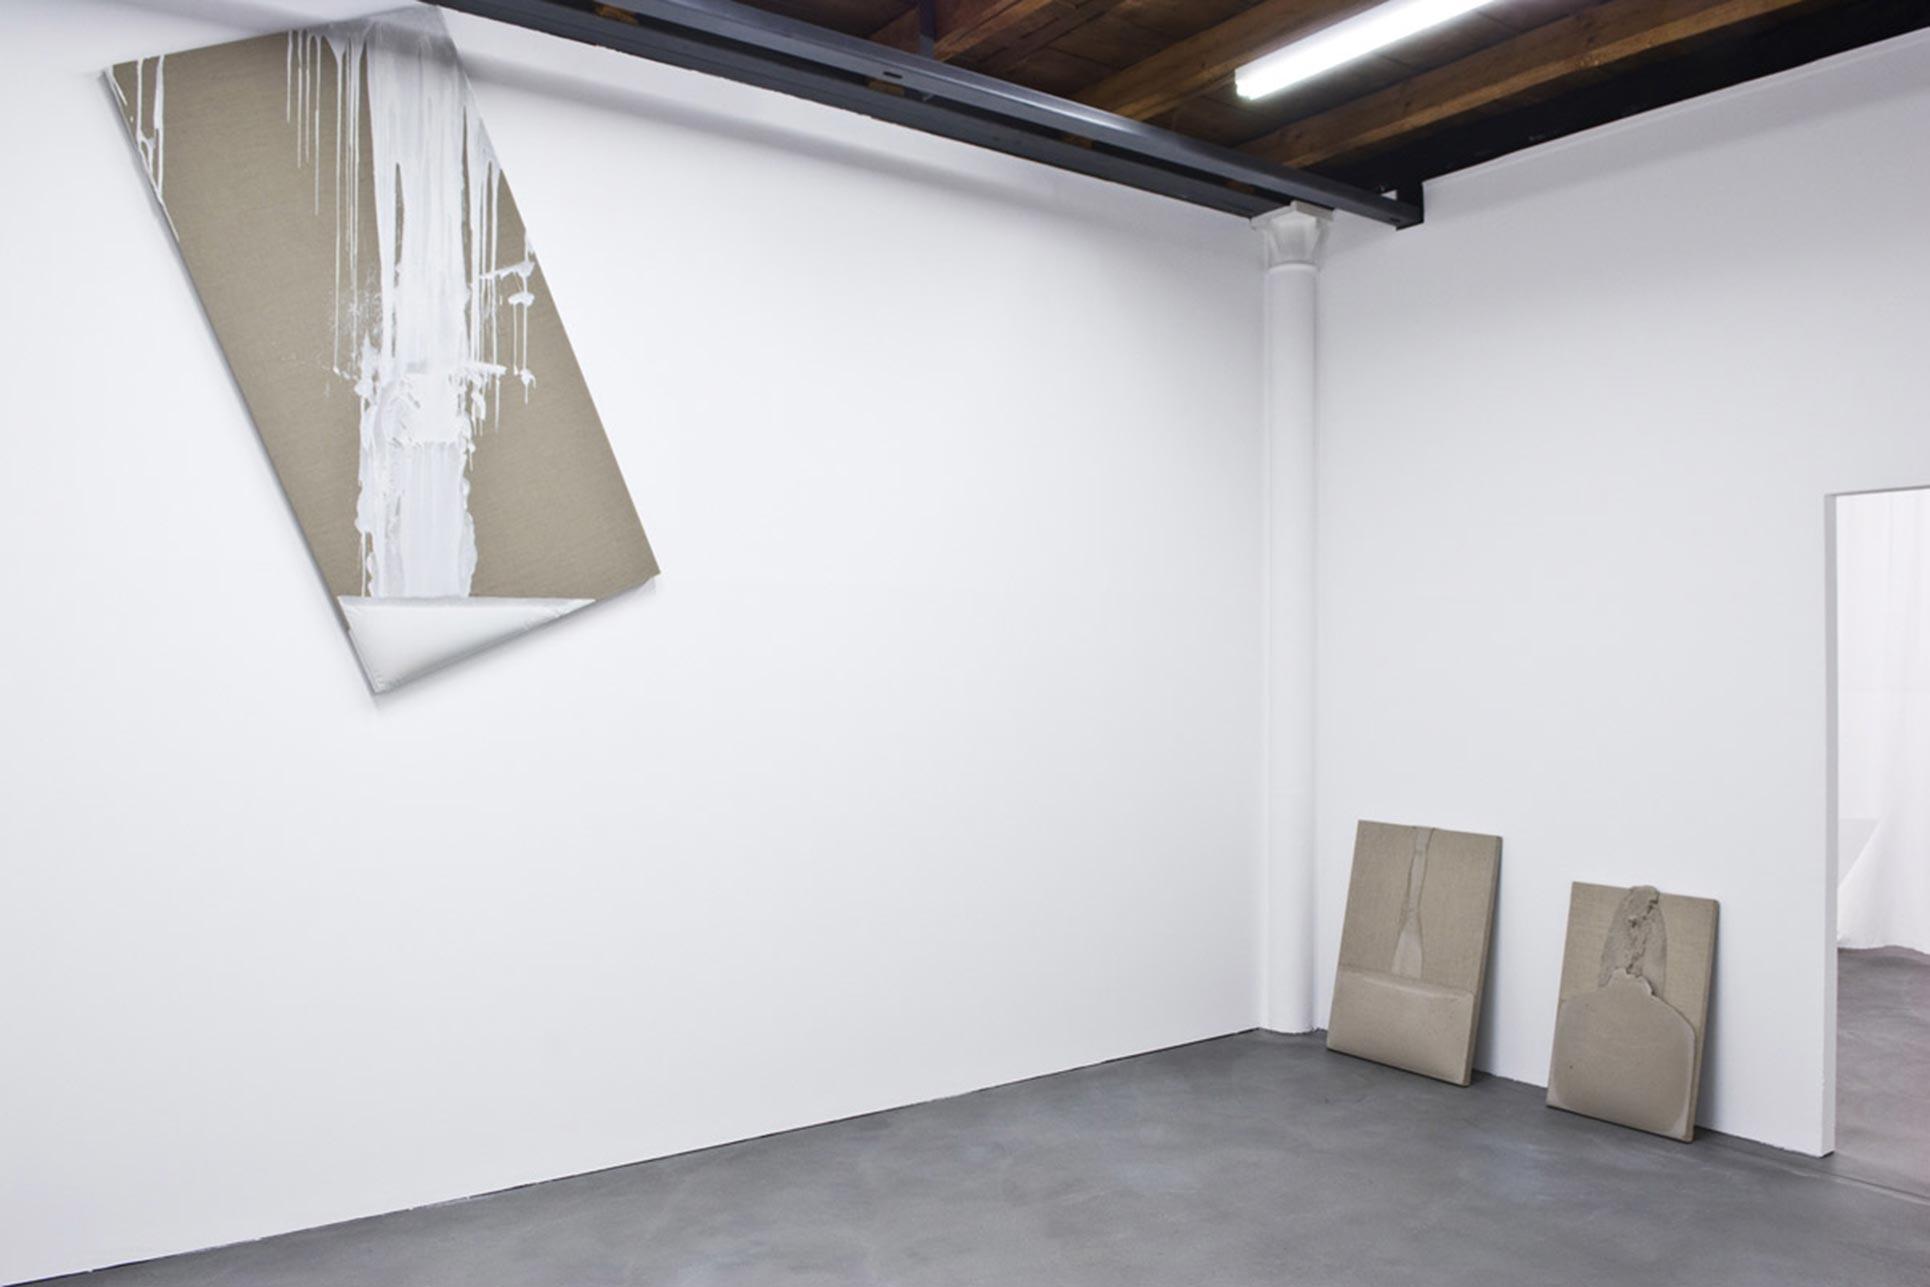 Analia Saban. Decant (from Floor) #, 2012 (Photo: Primula Bosshard)